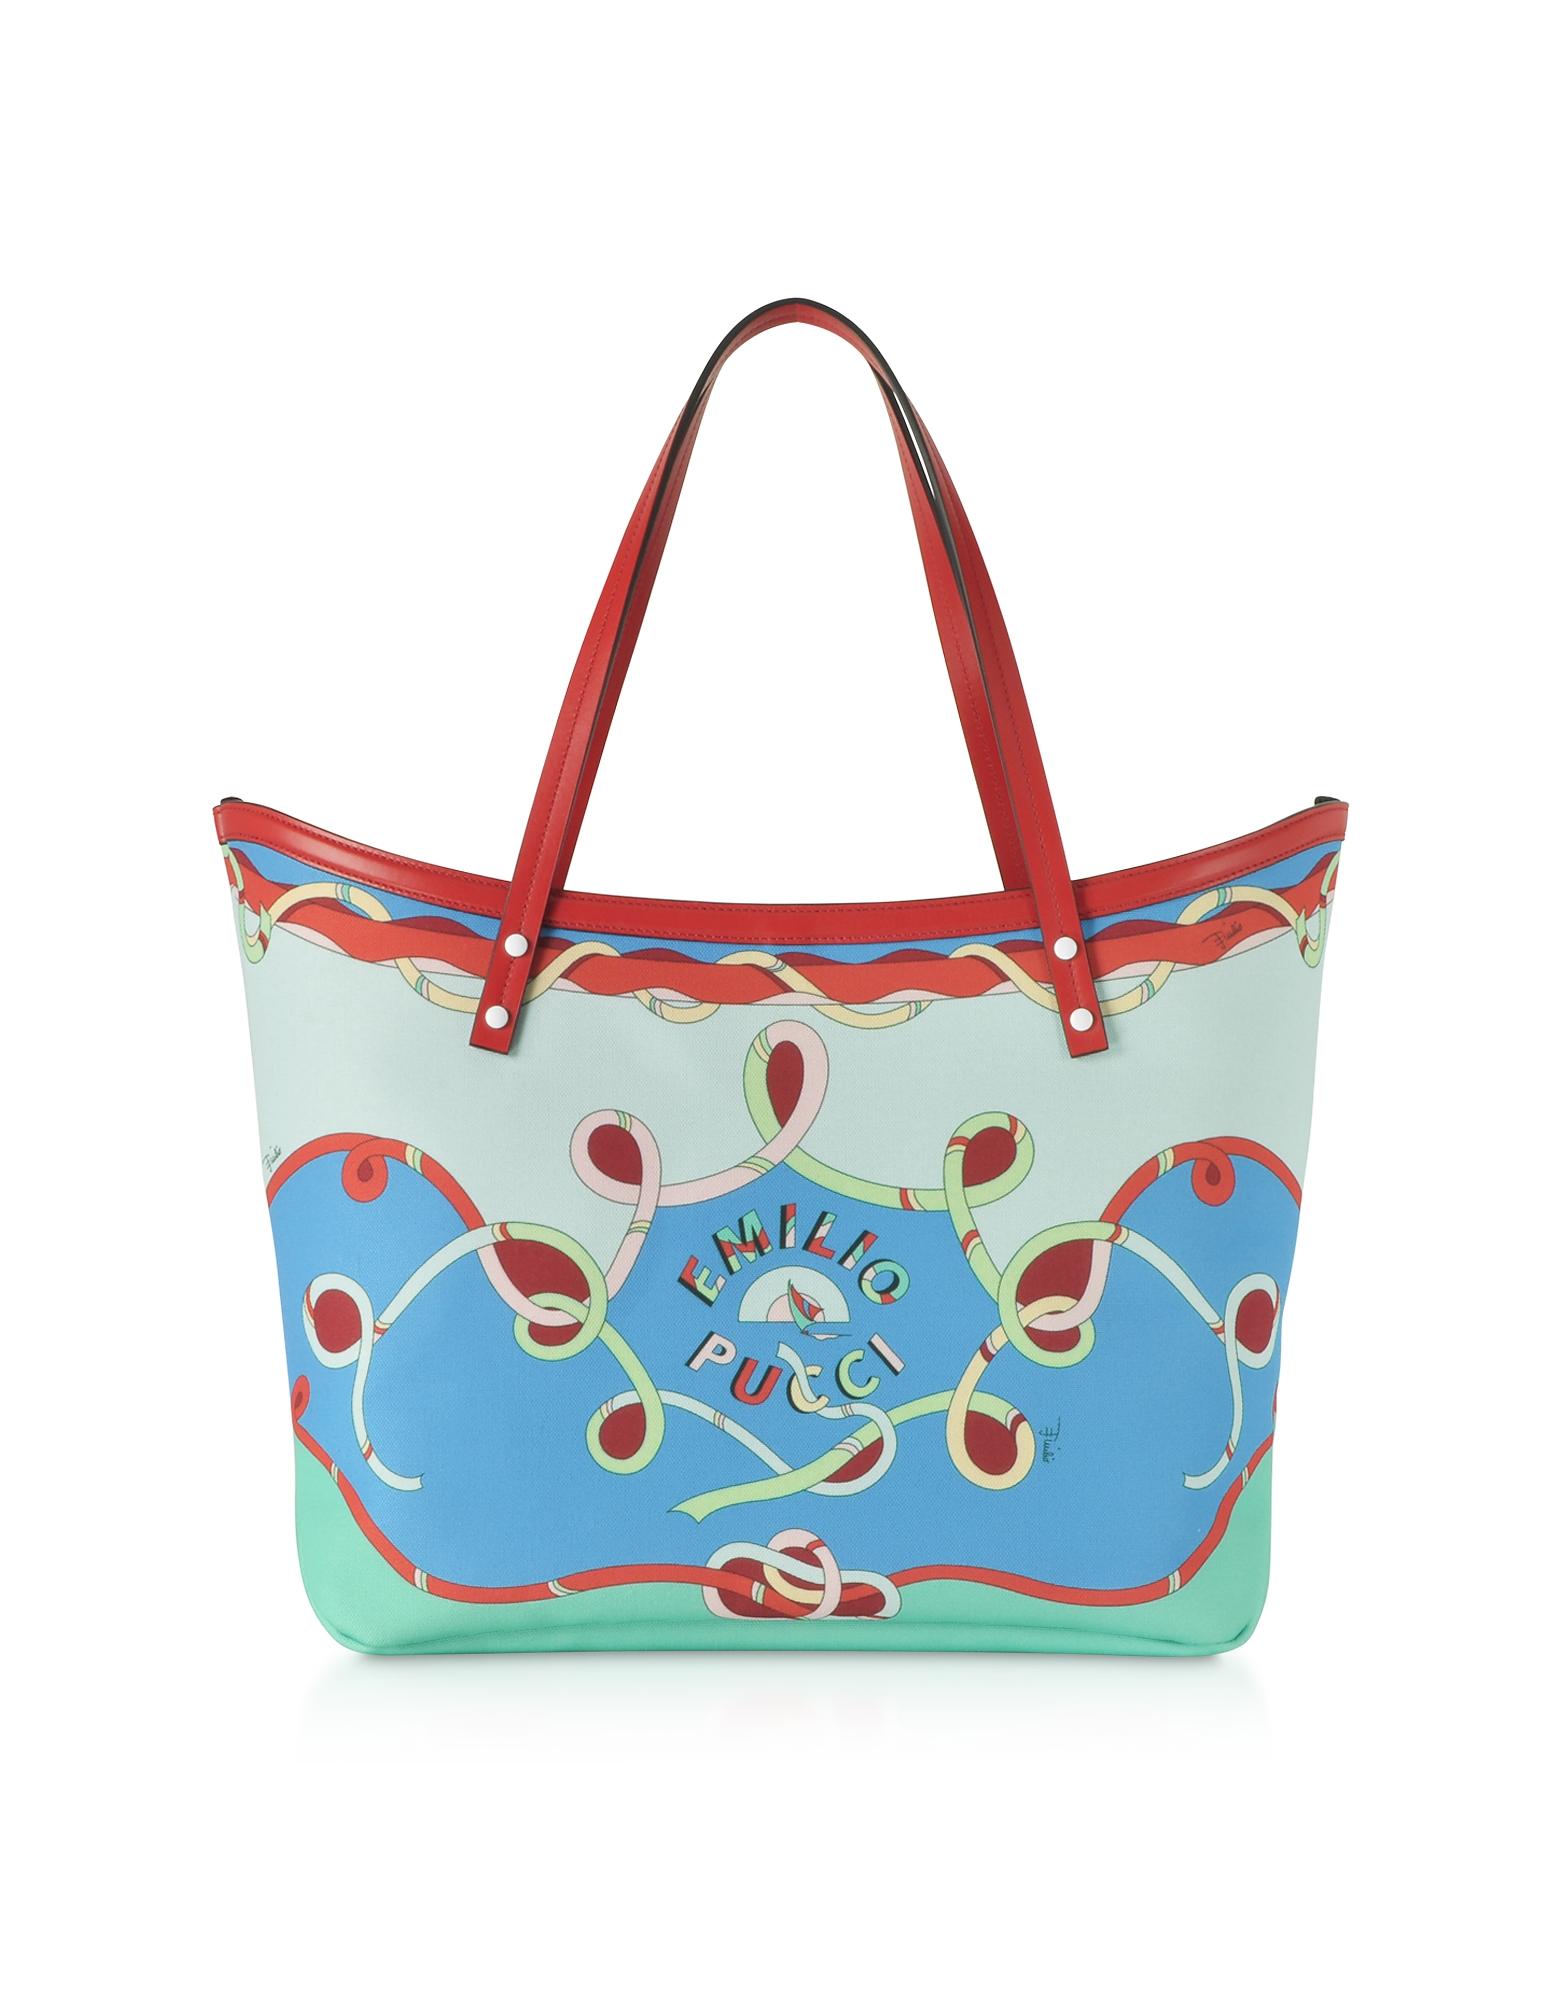 Cornflower Tote Bag w/Pouch